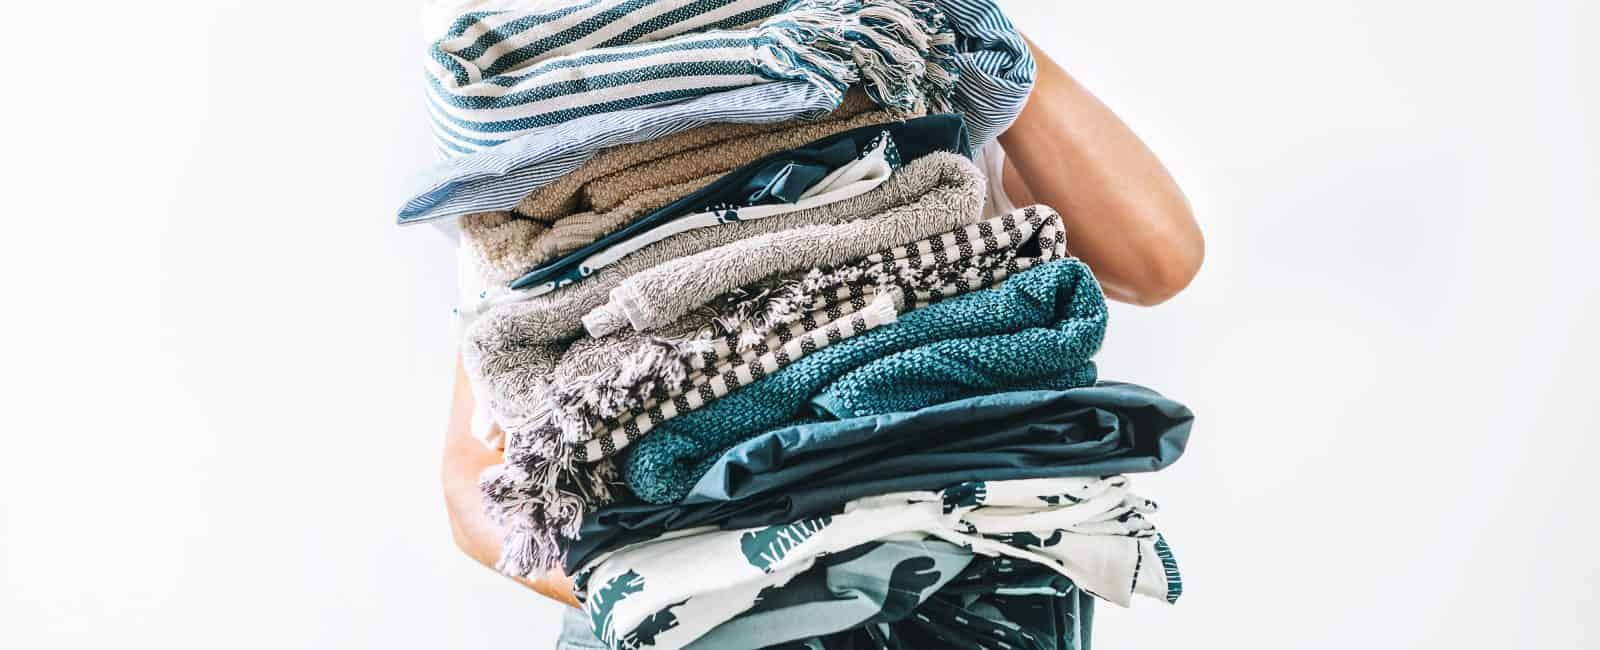 16 Things Marie Kondo Says Everyone Should Discard